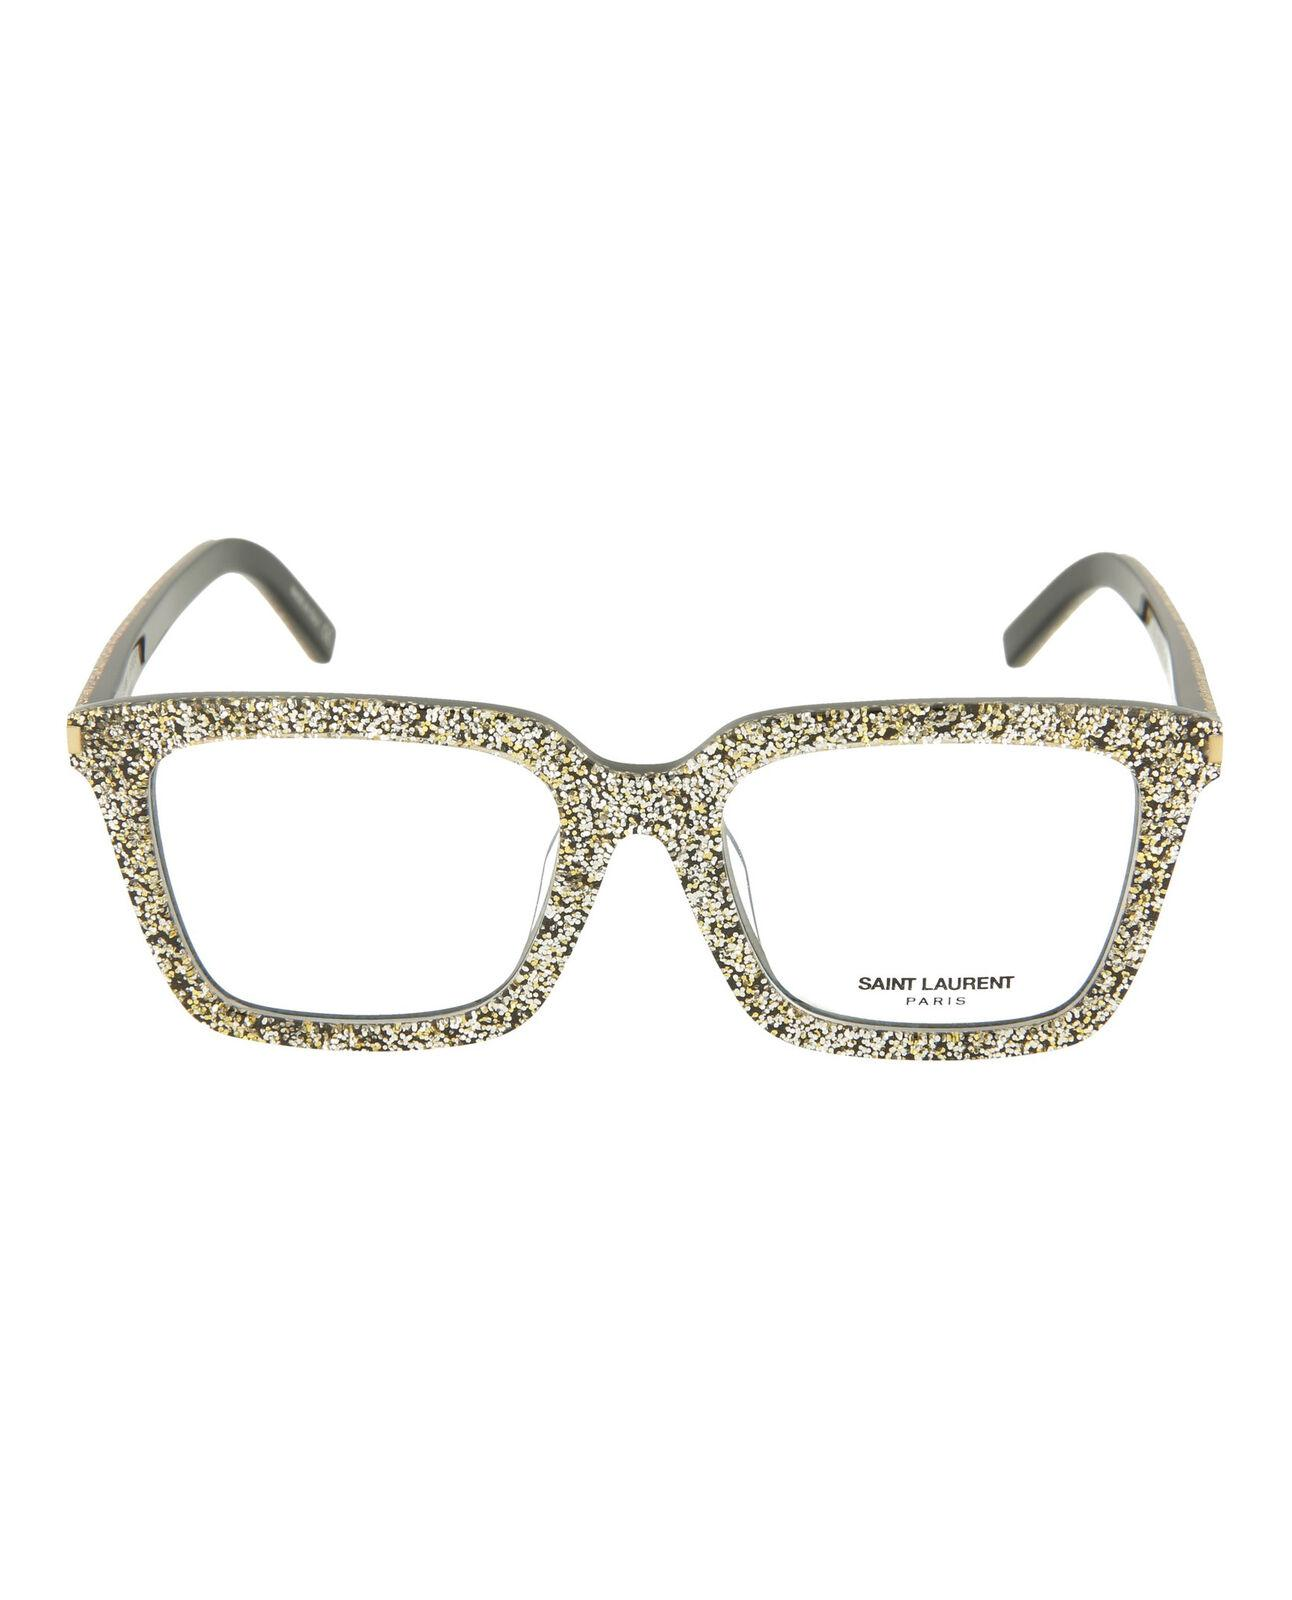 saint laurent女款方形光学眼镜架